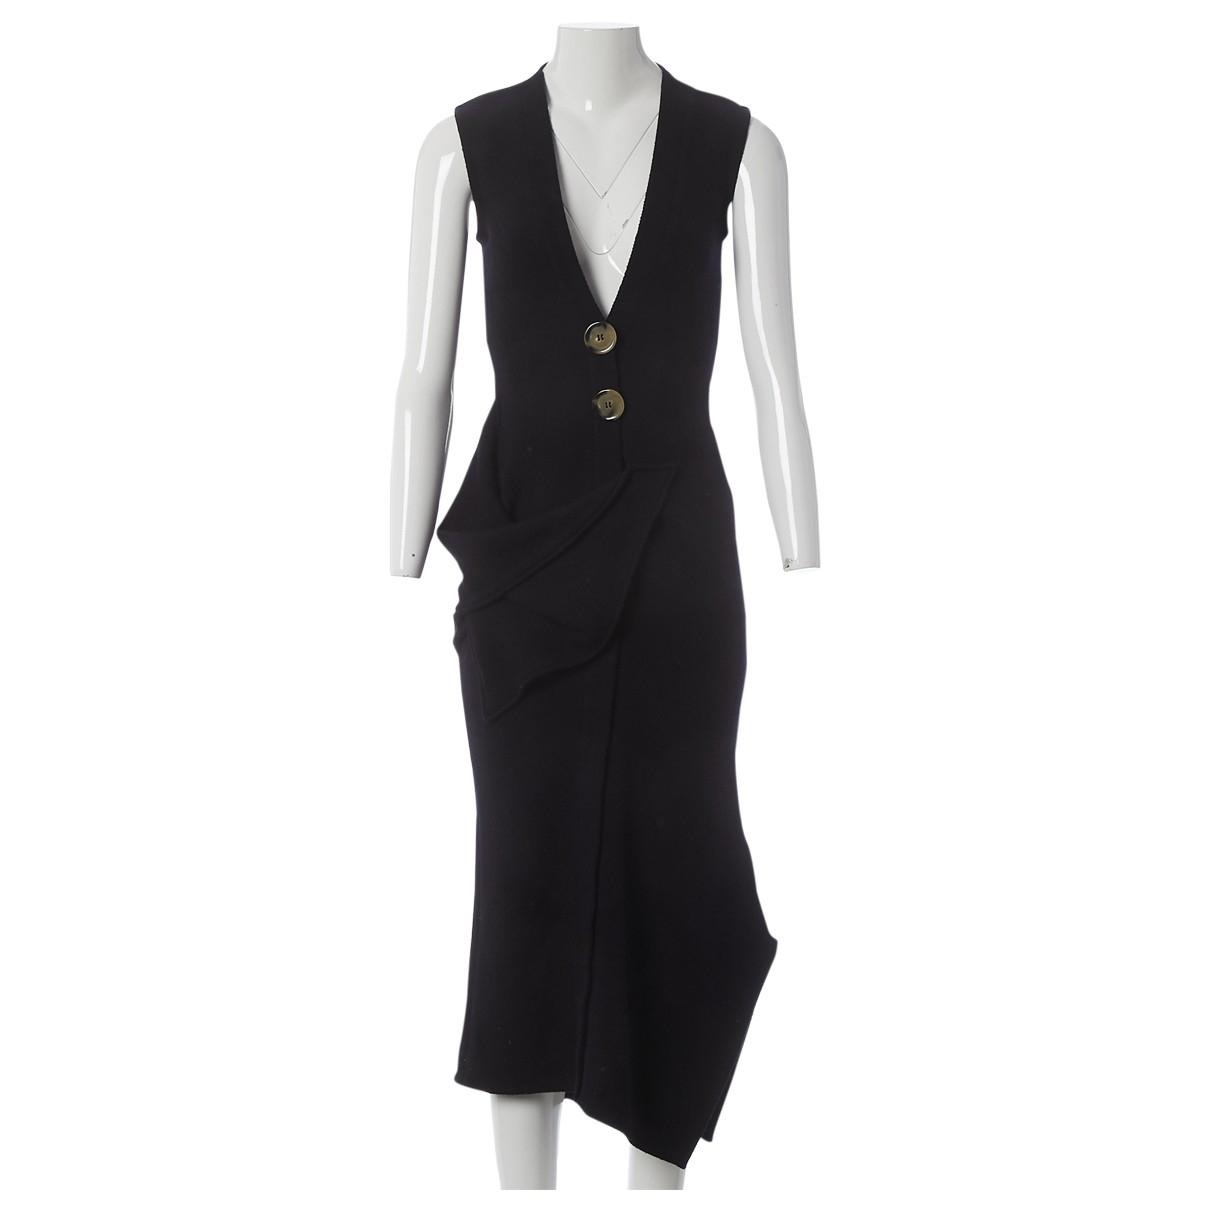 Victoria Beckham \N Black Wool dress for Women 8 UK